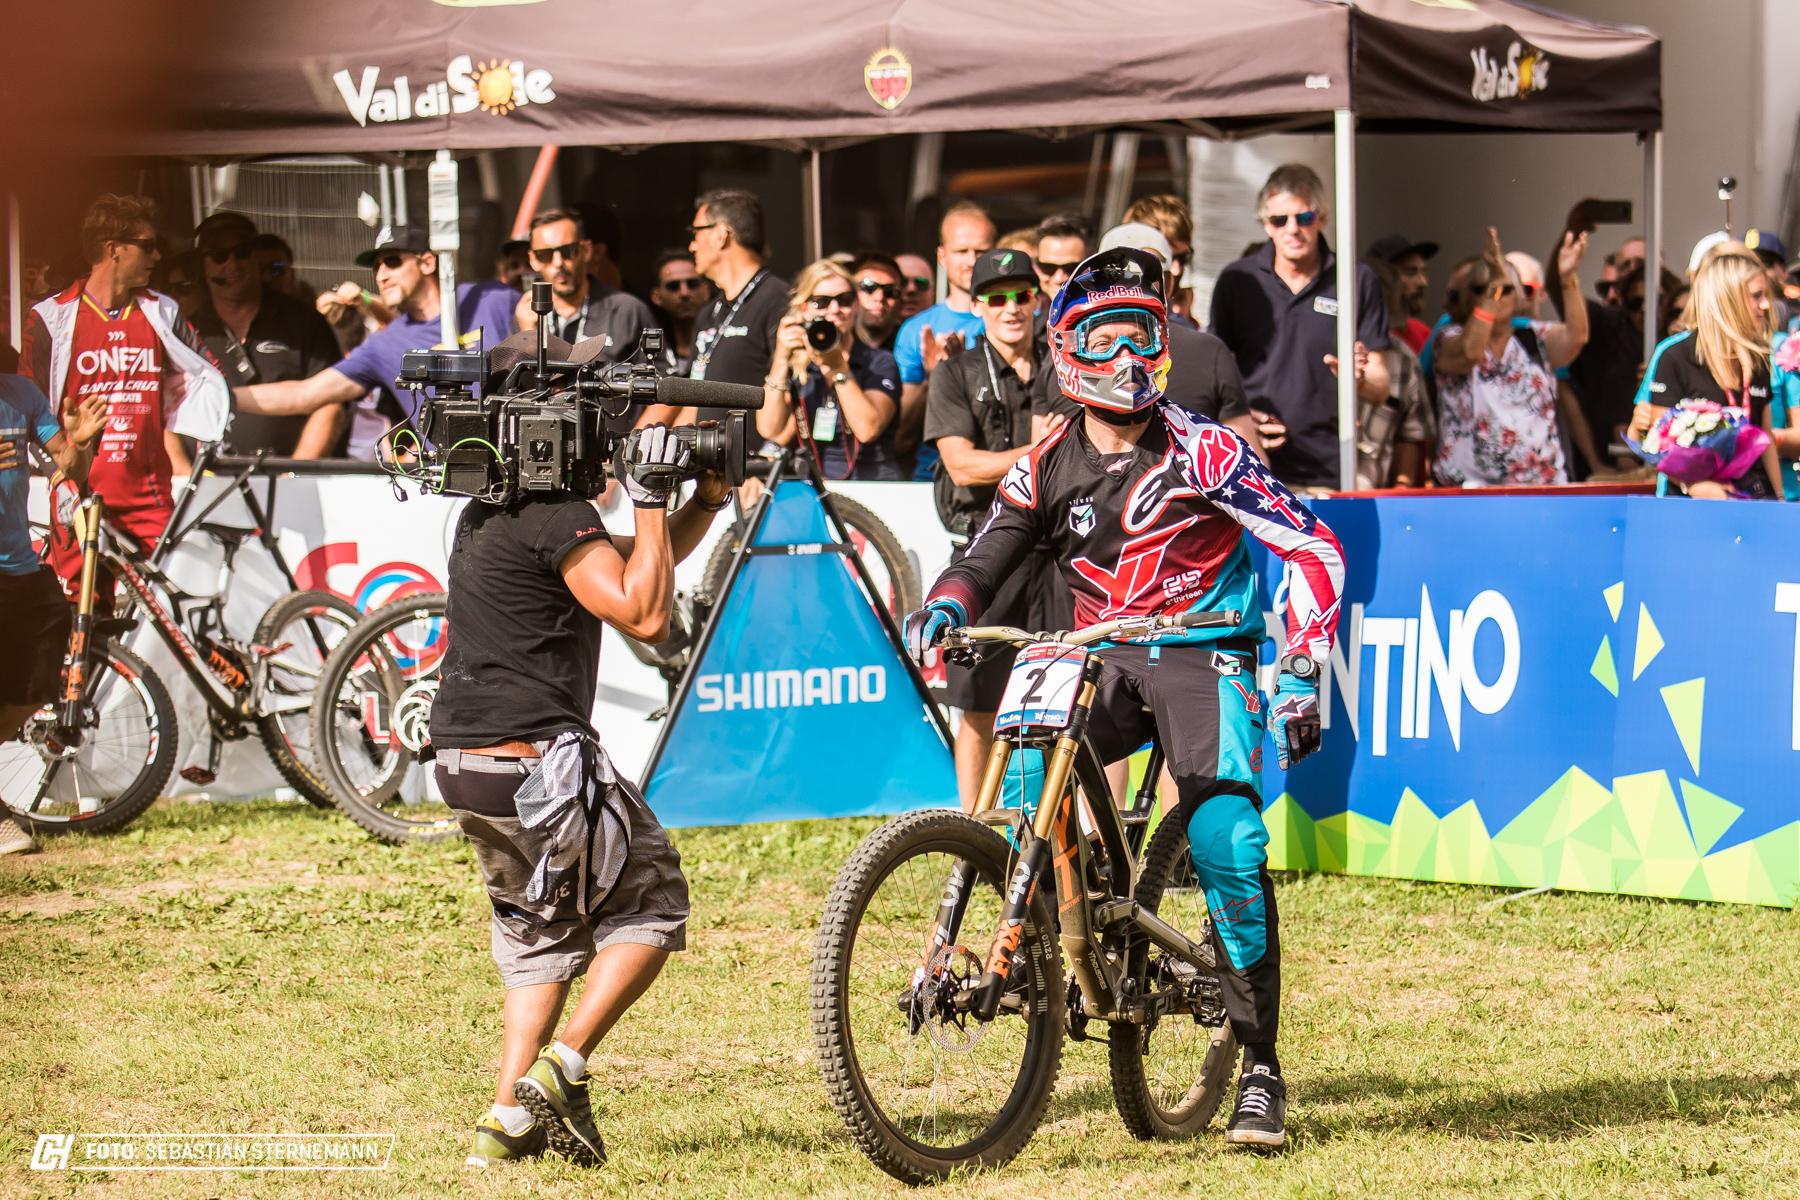 Saturday Val di Sole2717 Cycleholix